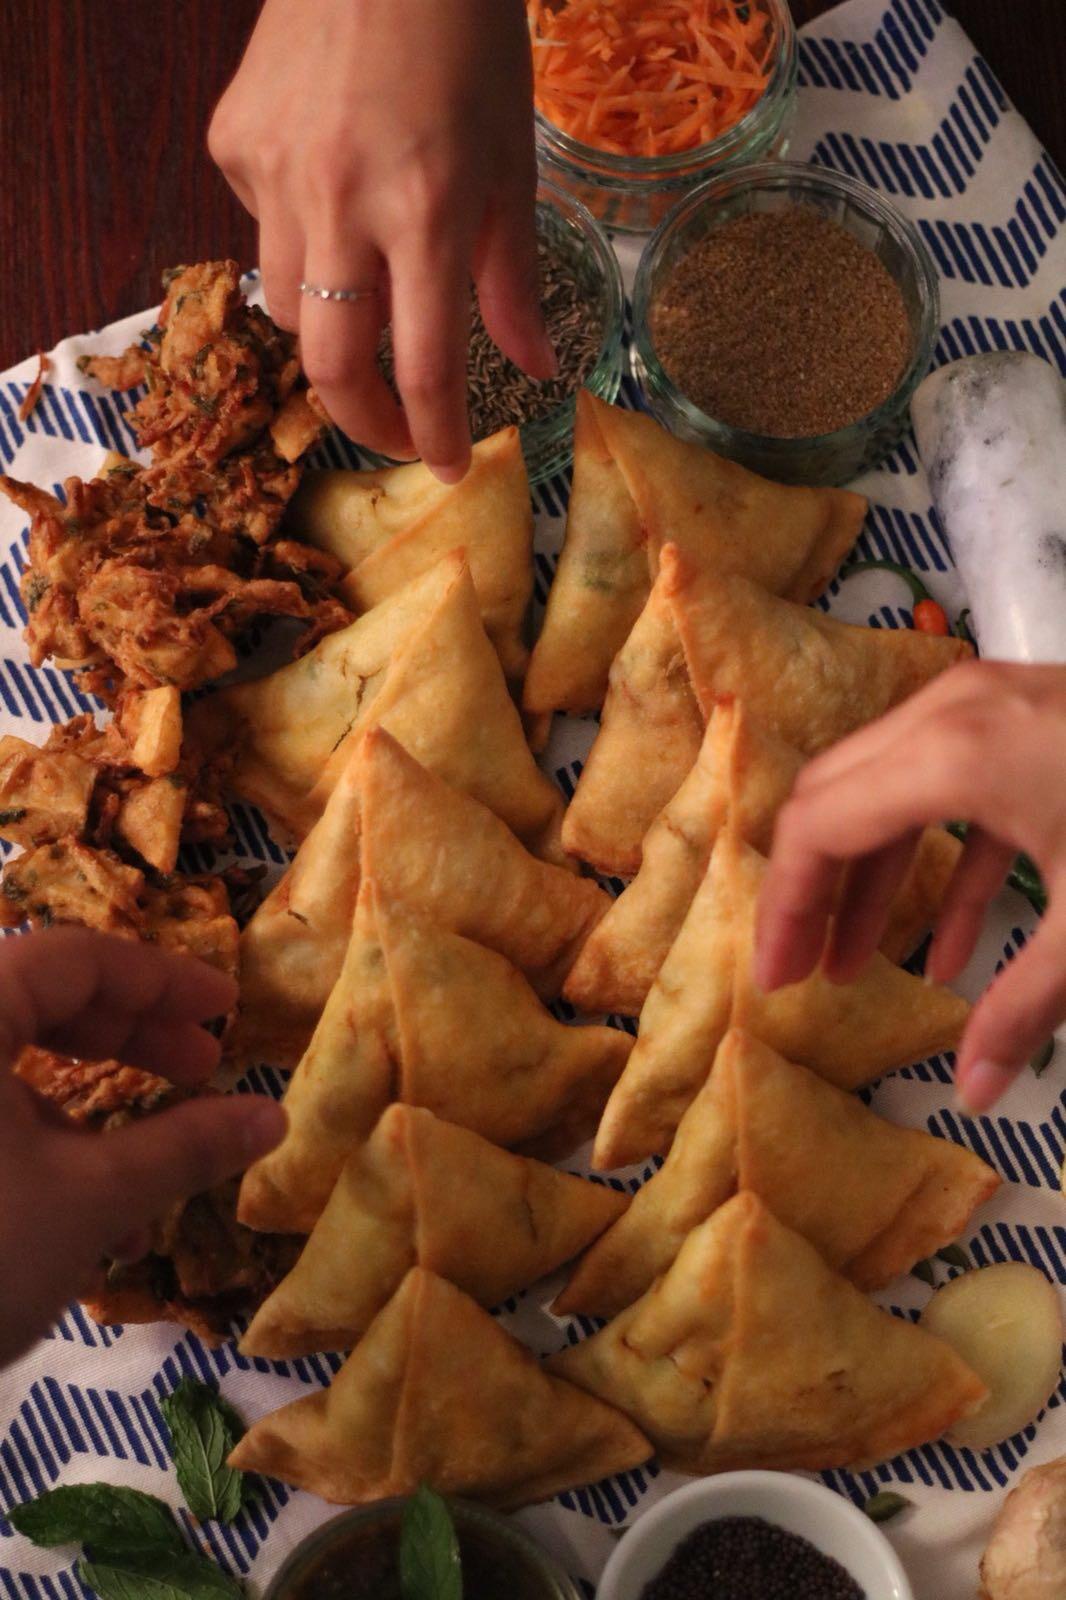 sharing samosas and bhajis